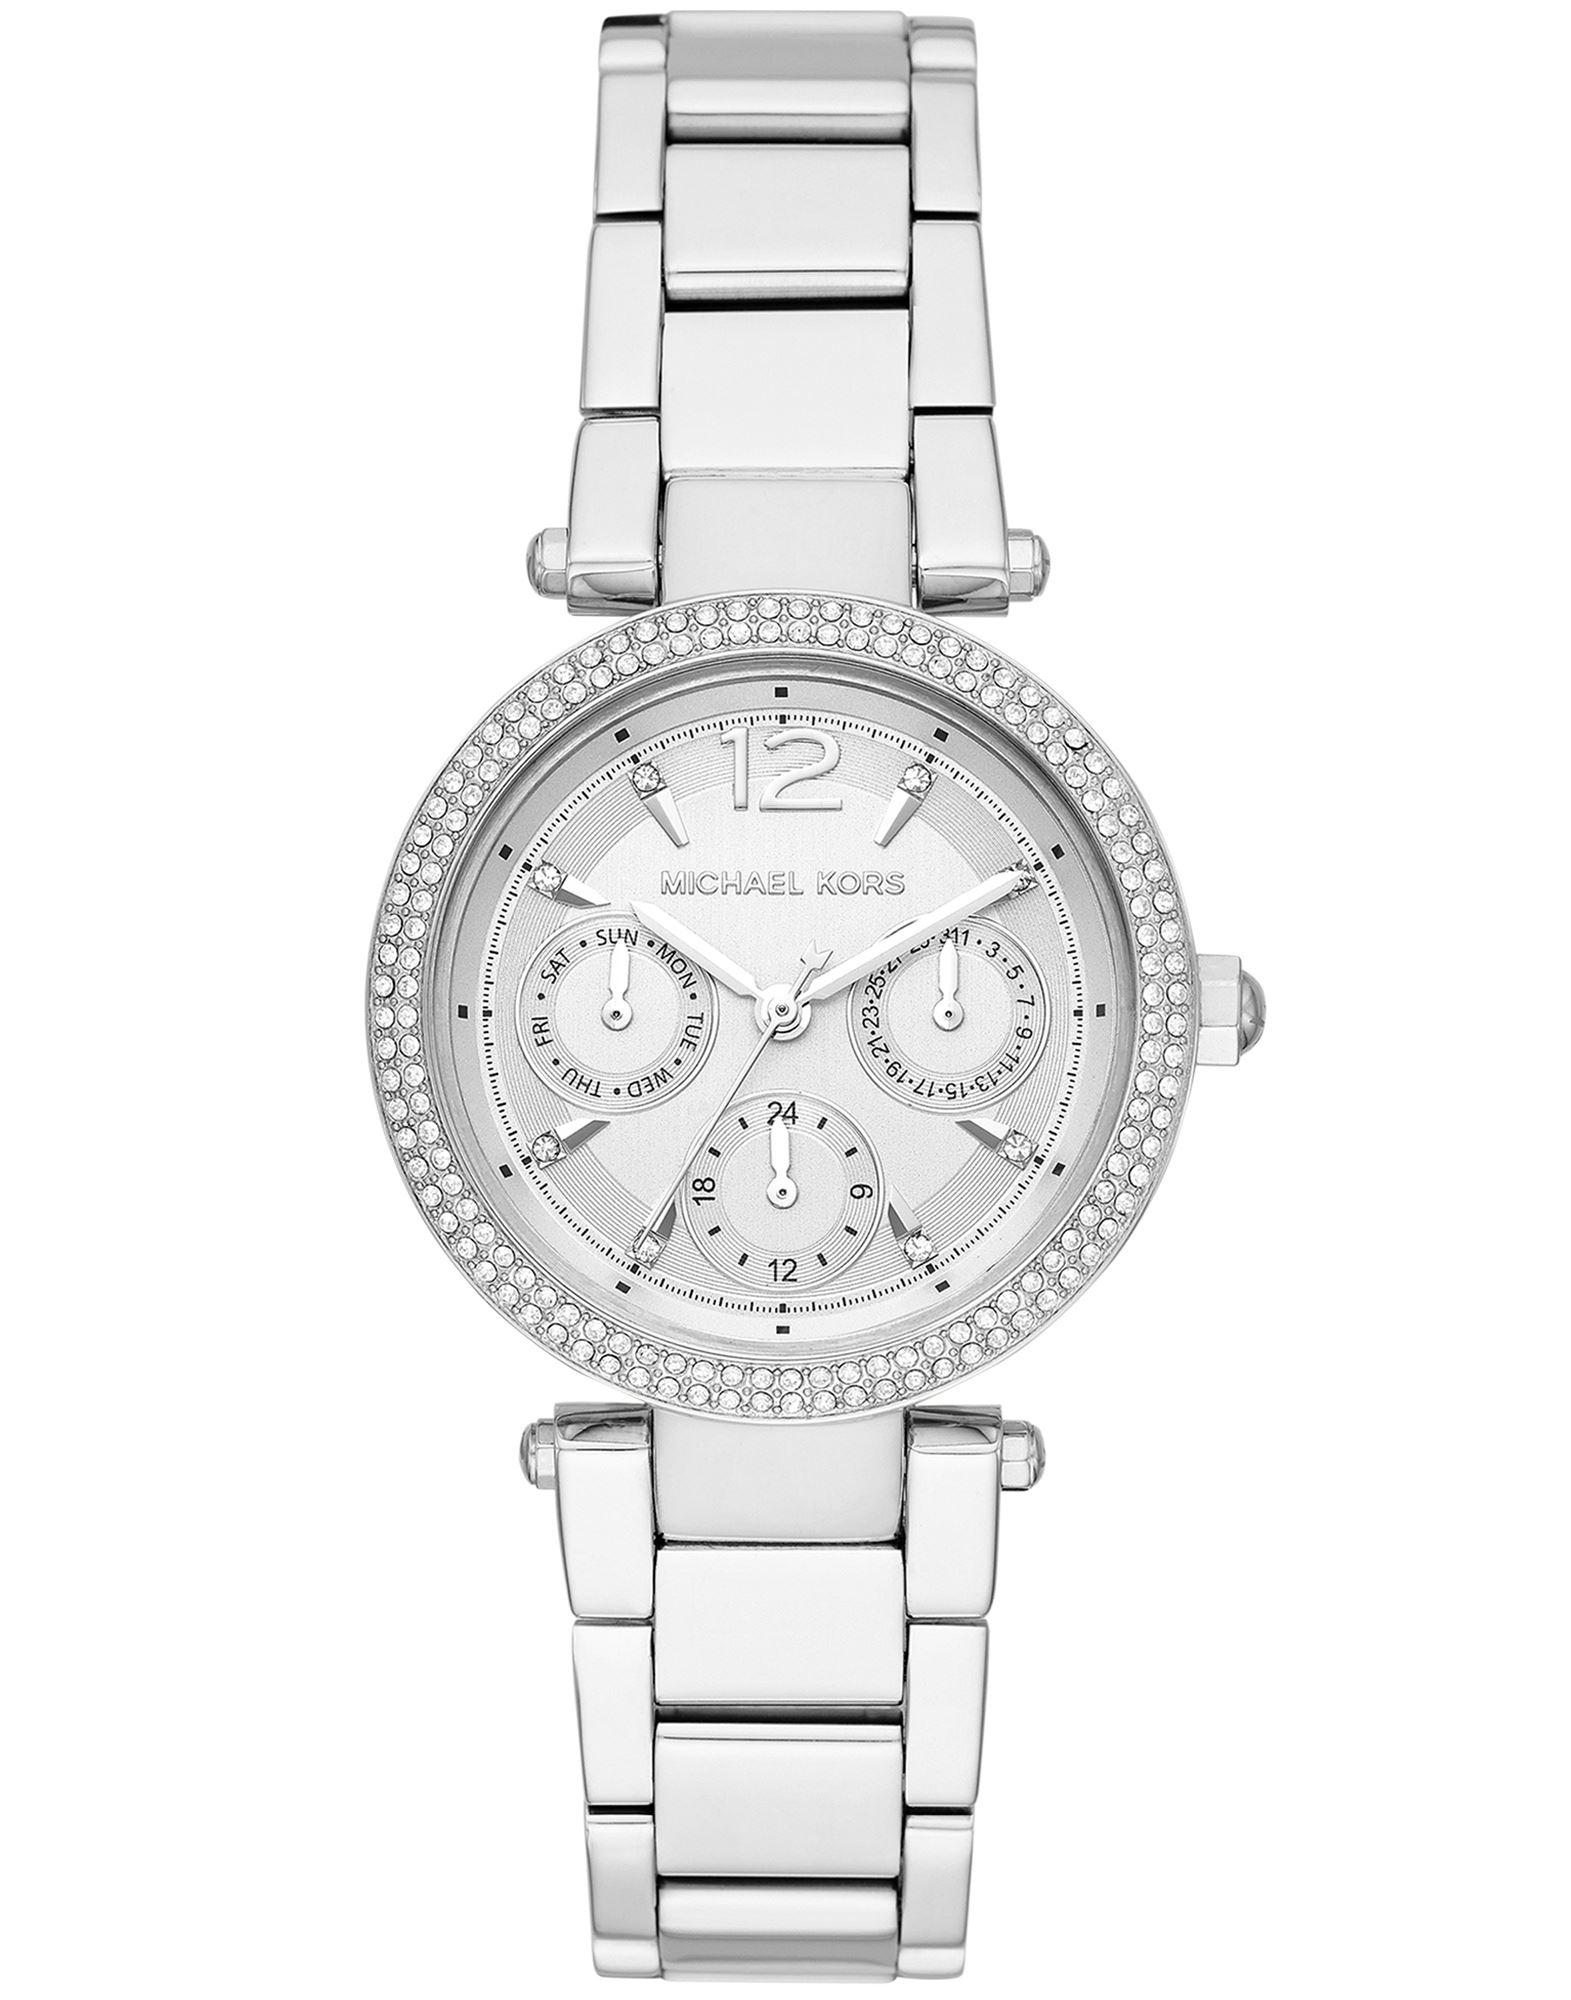 MICHAEL KORS Wrist watches - Item 58053197